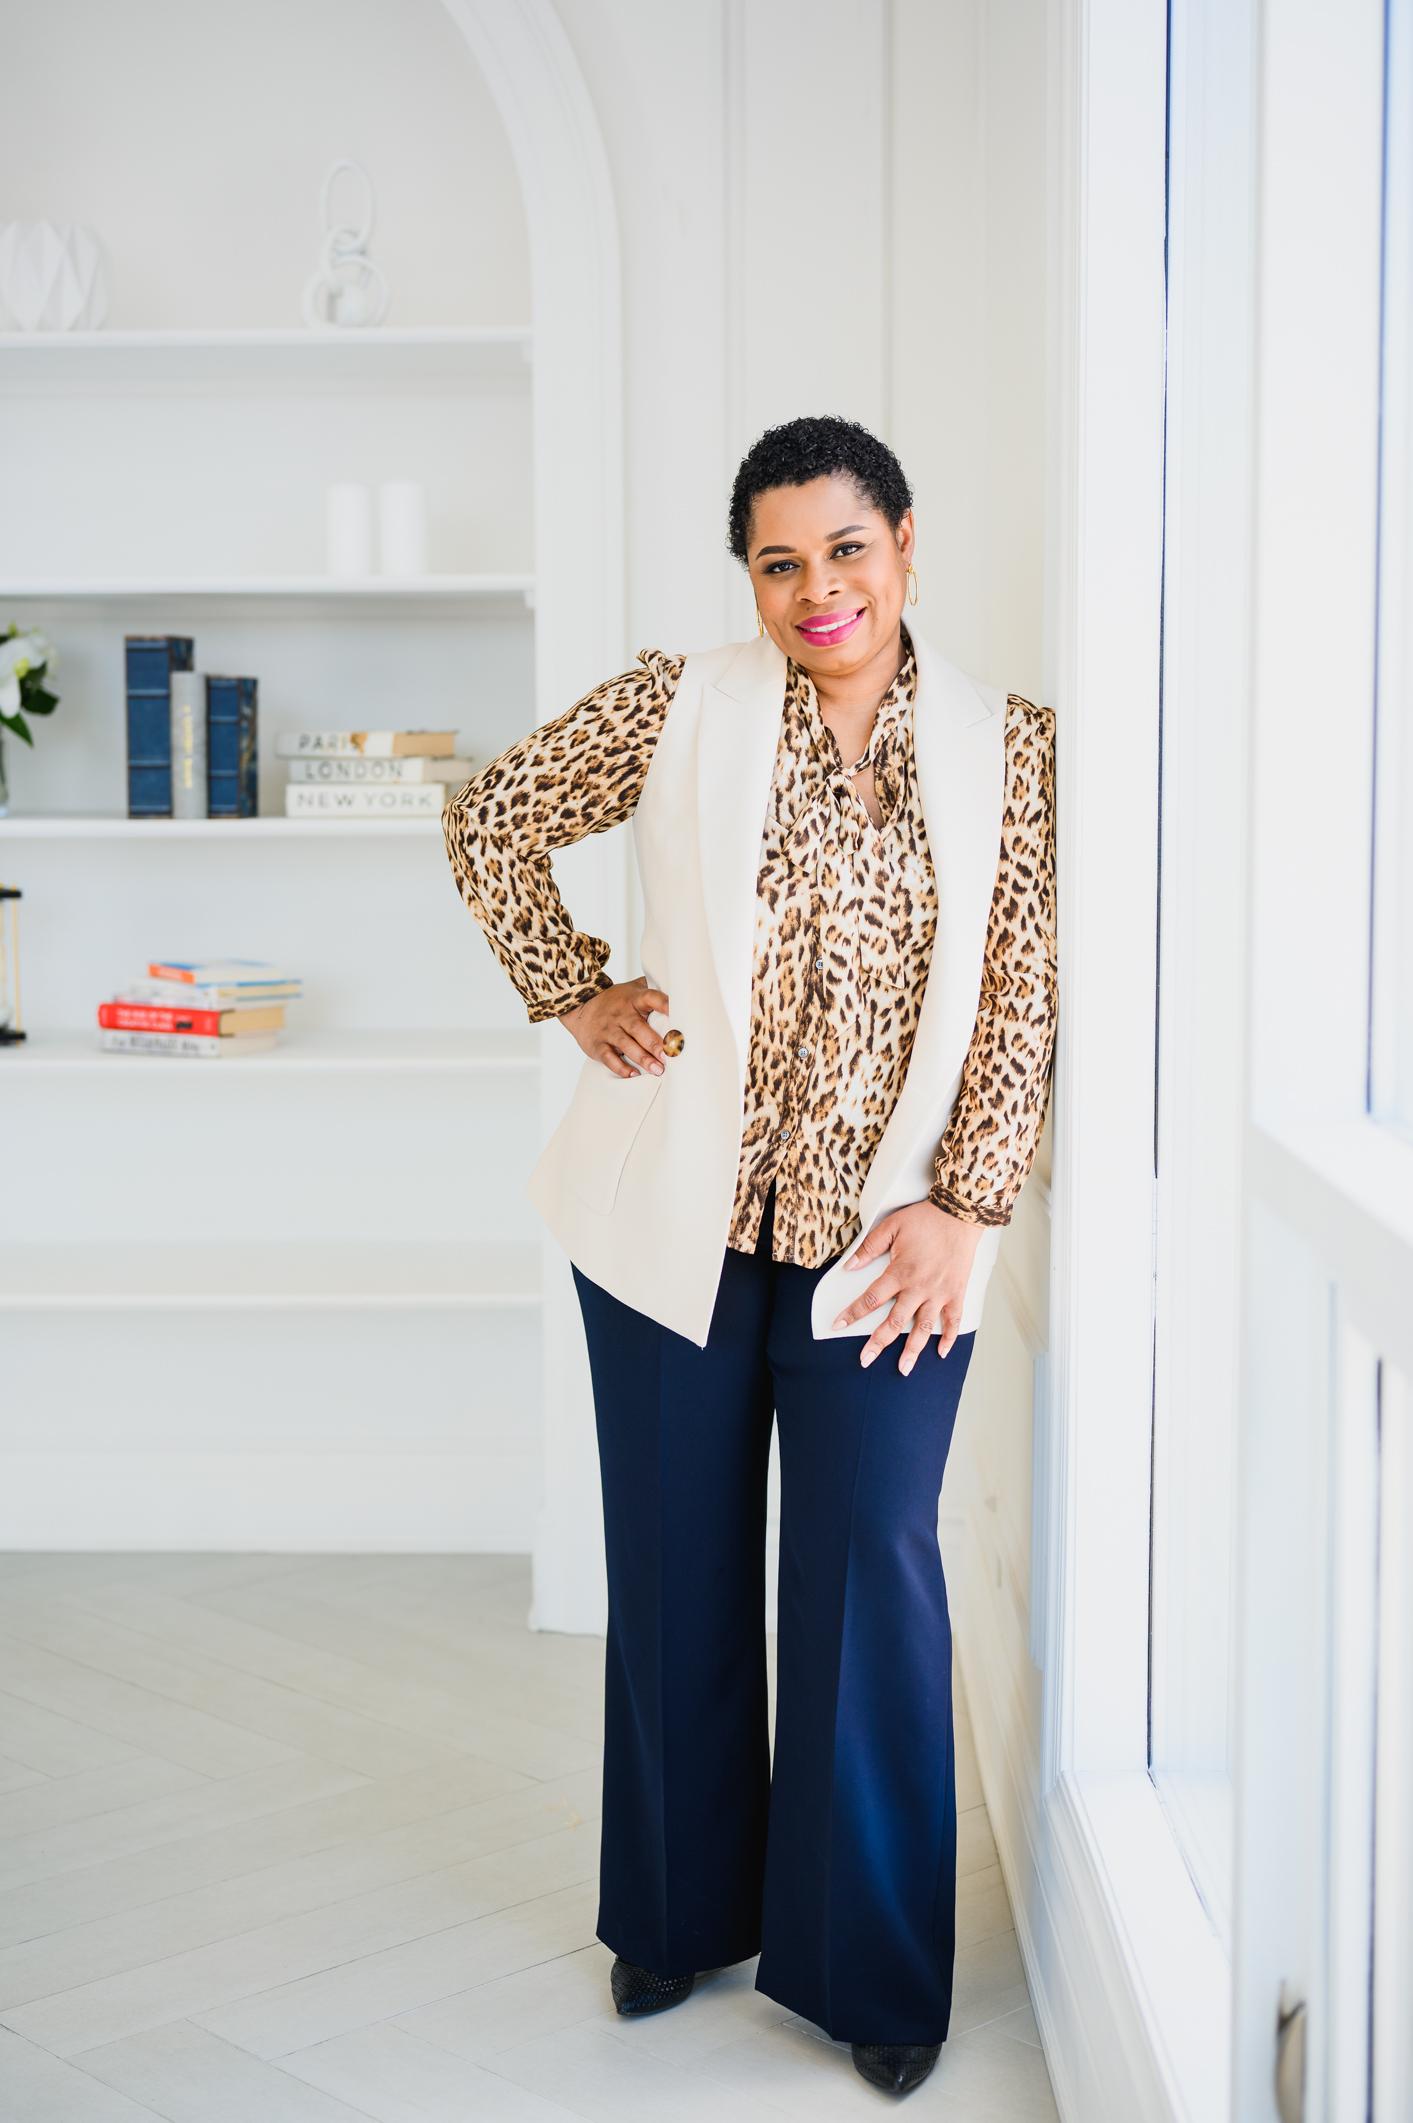 Andrea Henry Business LAW - WEB - 2019 - Branding Photography - Mike Black PhotoWorks dot com-10.jpg